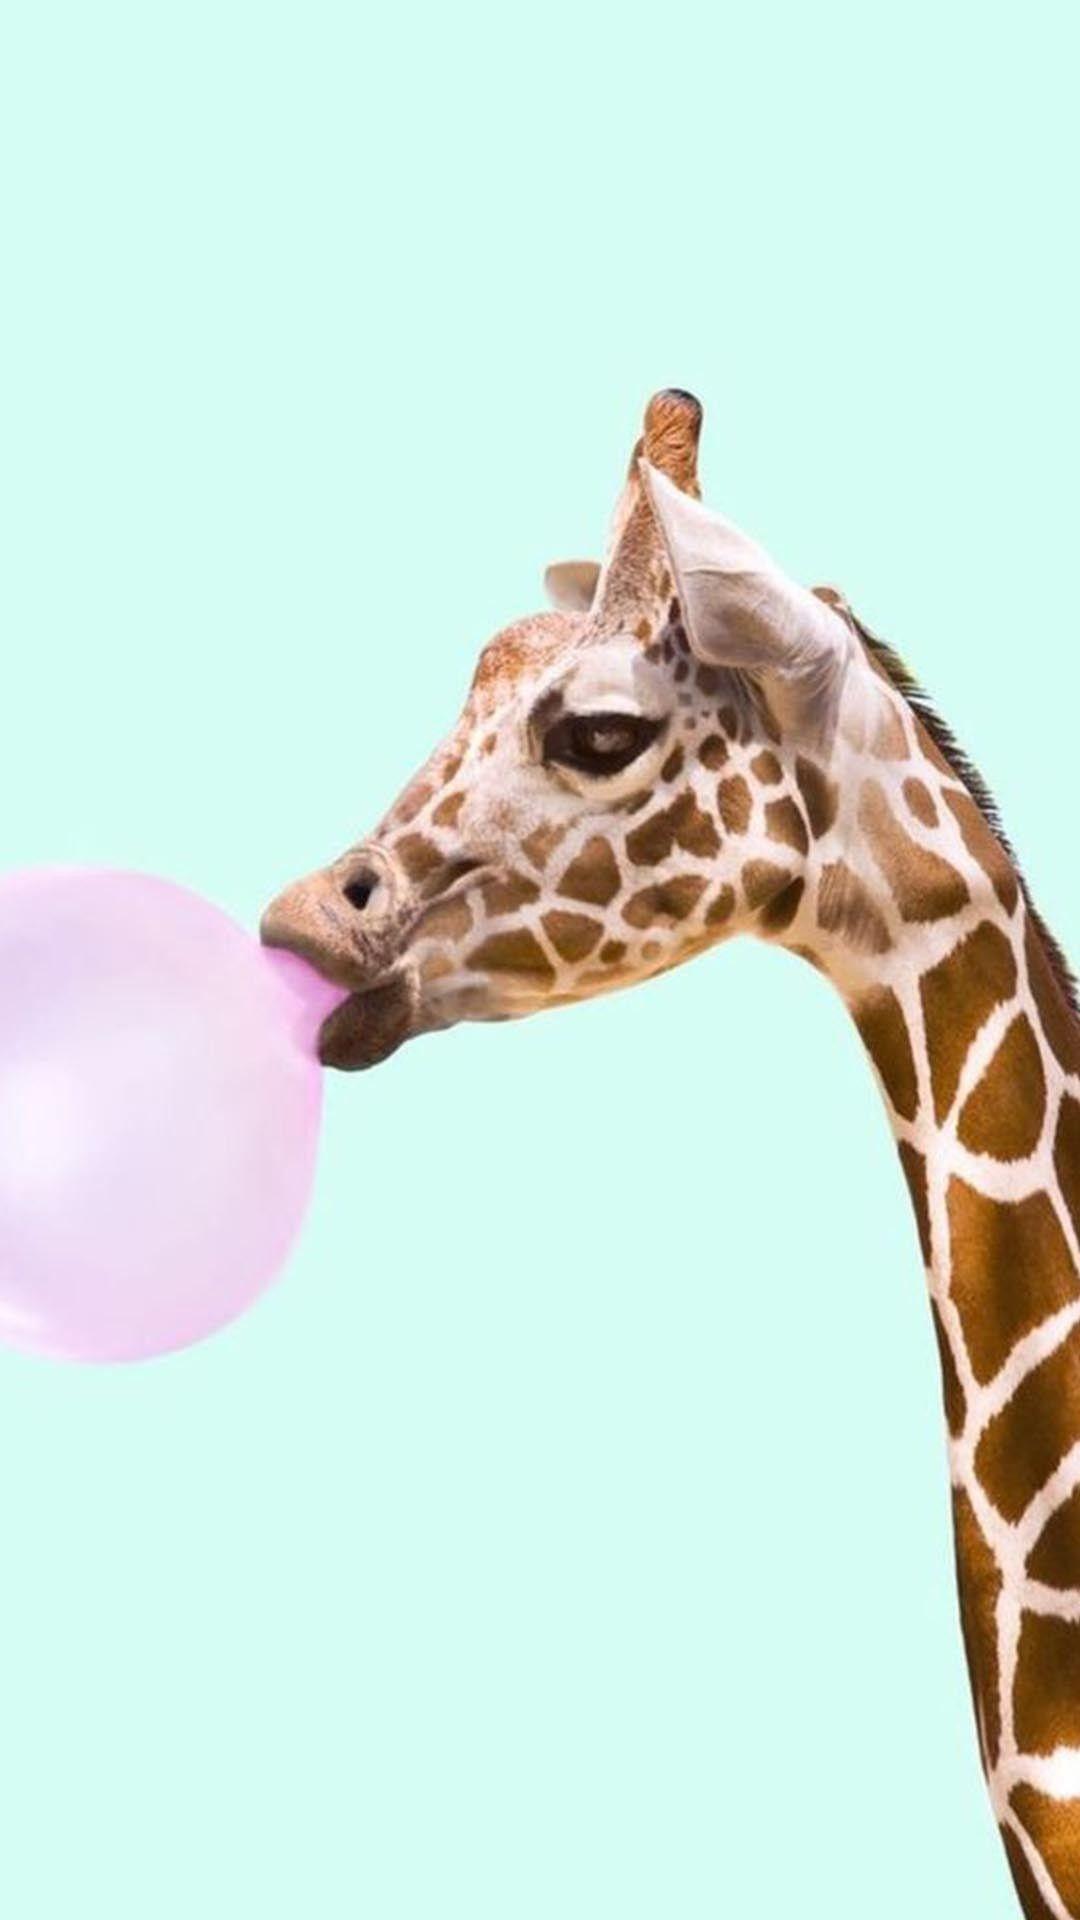 Giraffe Giraffidae Terrestrial Animal Neck Wildlife Snout Animal Wallpaper Iphone Wallpaper Glitter Iphone Wallpaper Hipster